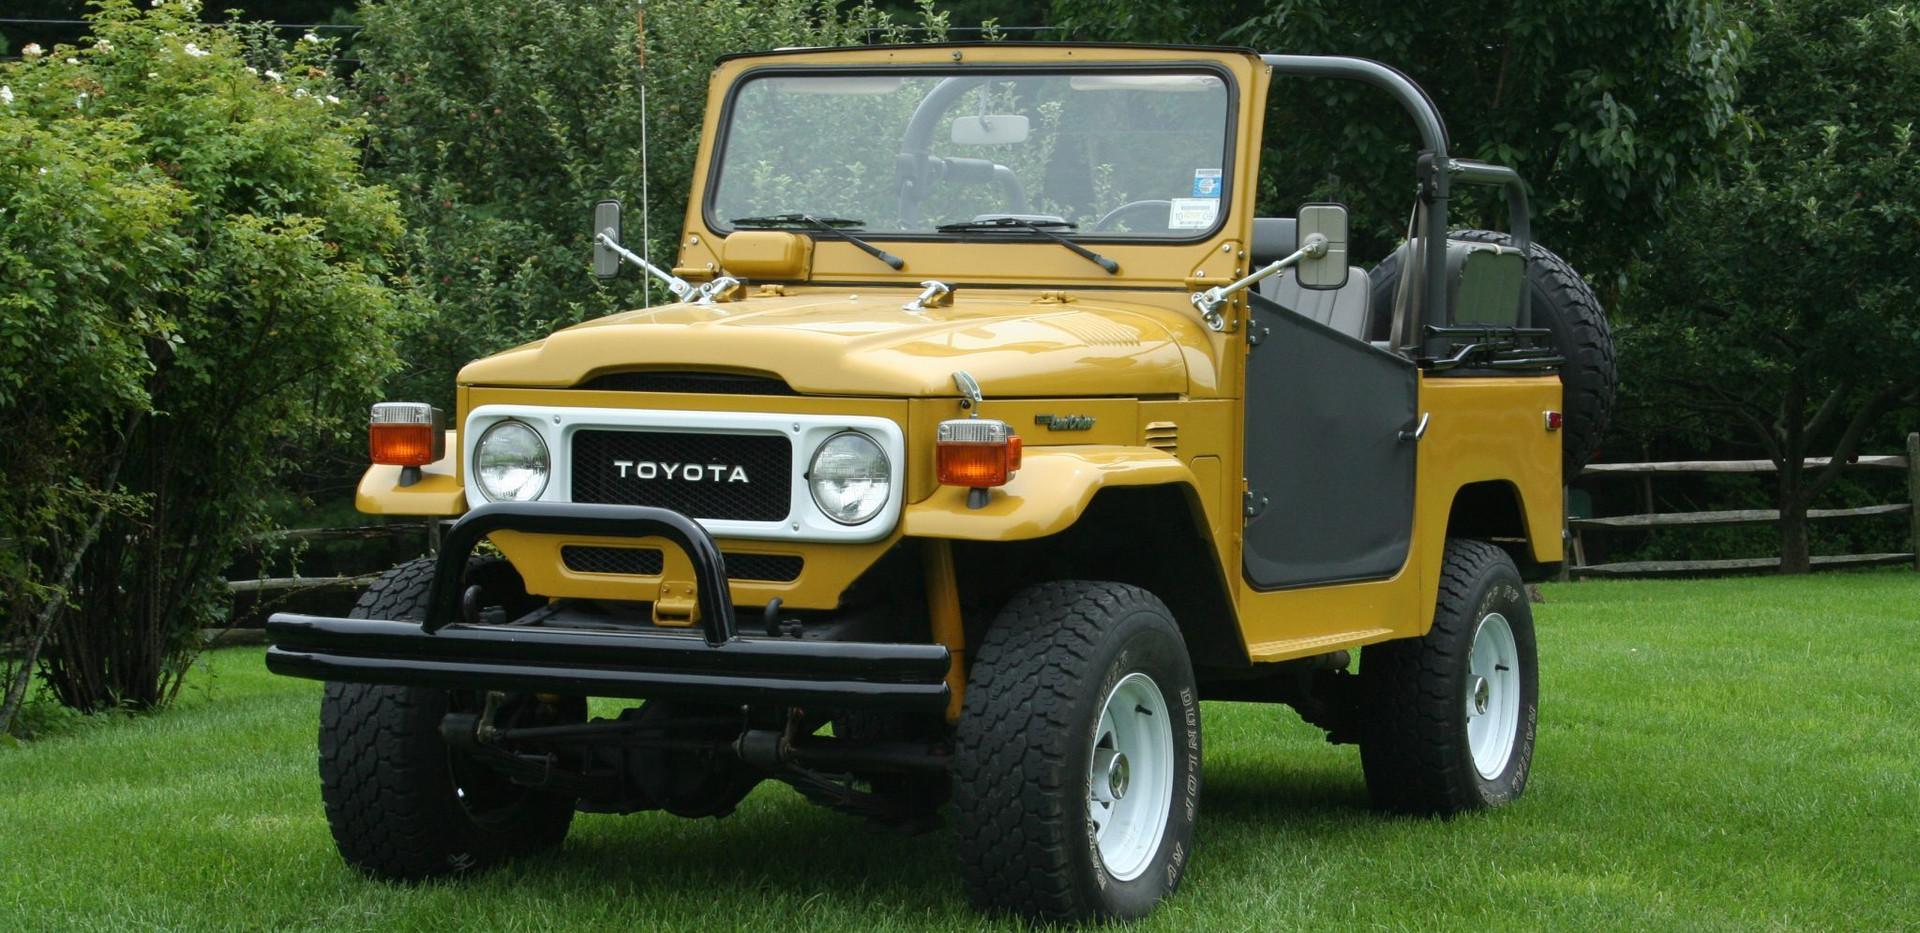 1982_toyota_land_cruiser_fj40_1594817388